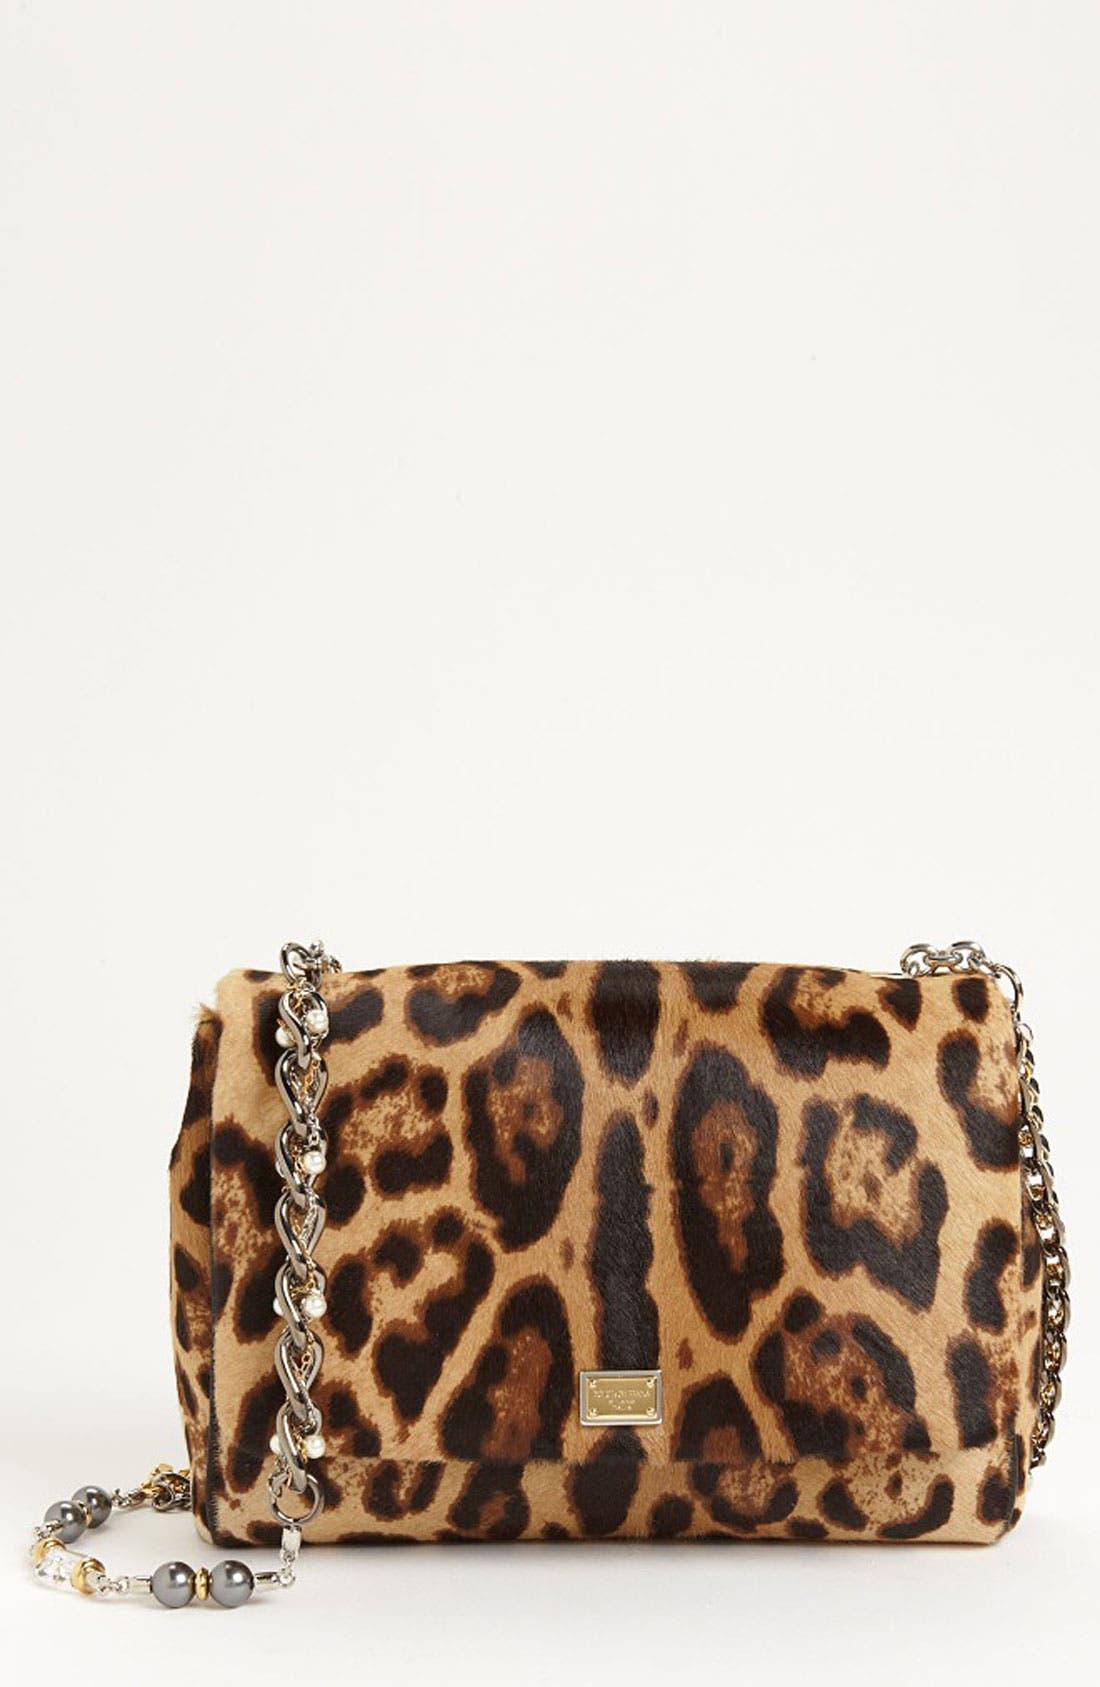 Main Image - Dolce&Gabbana 'Miss Charles' Calf Hair Shoulder Bag